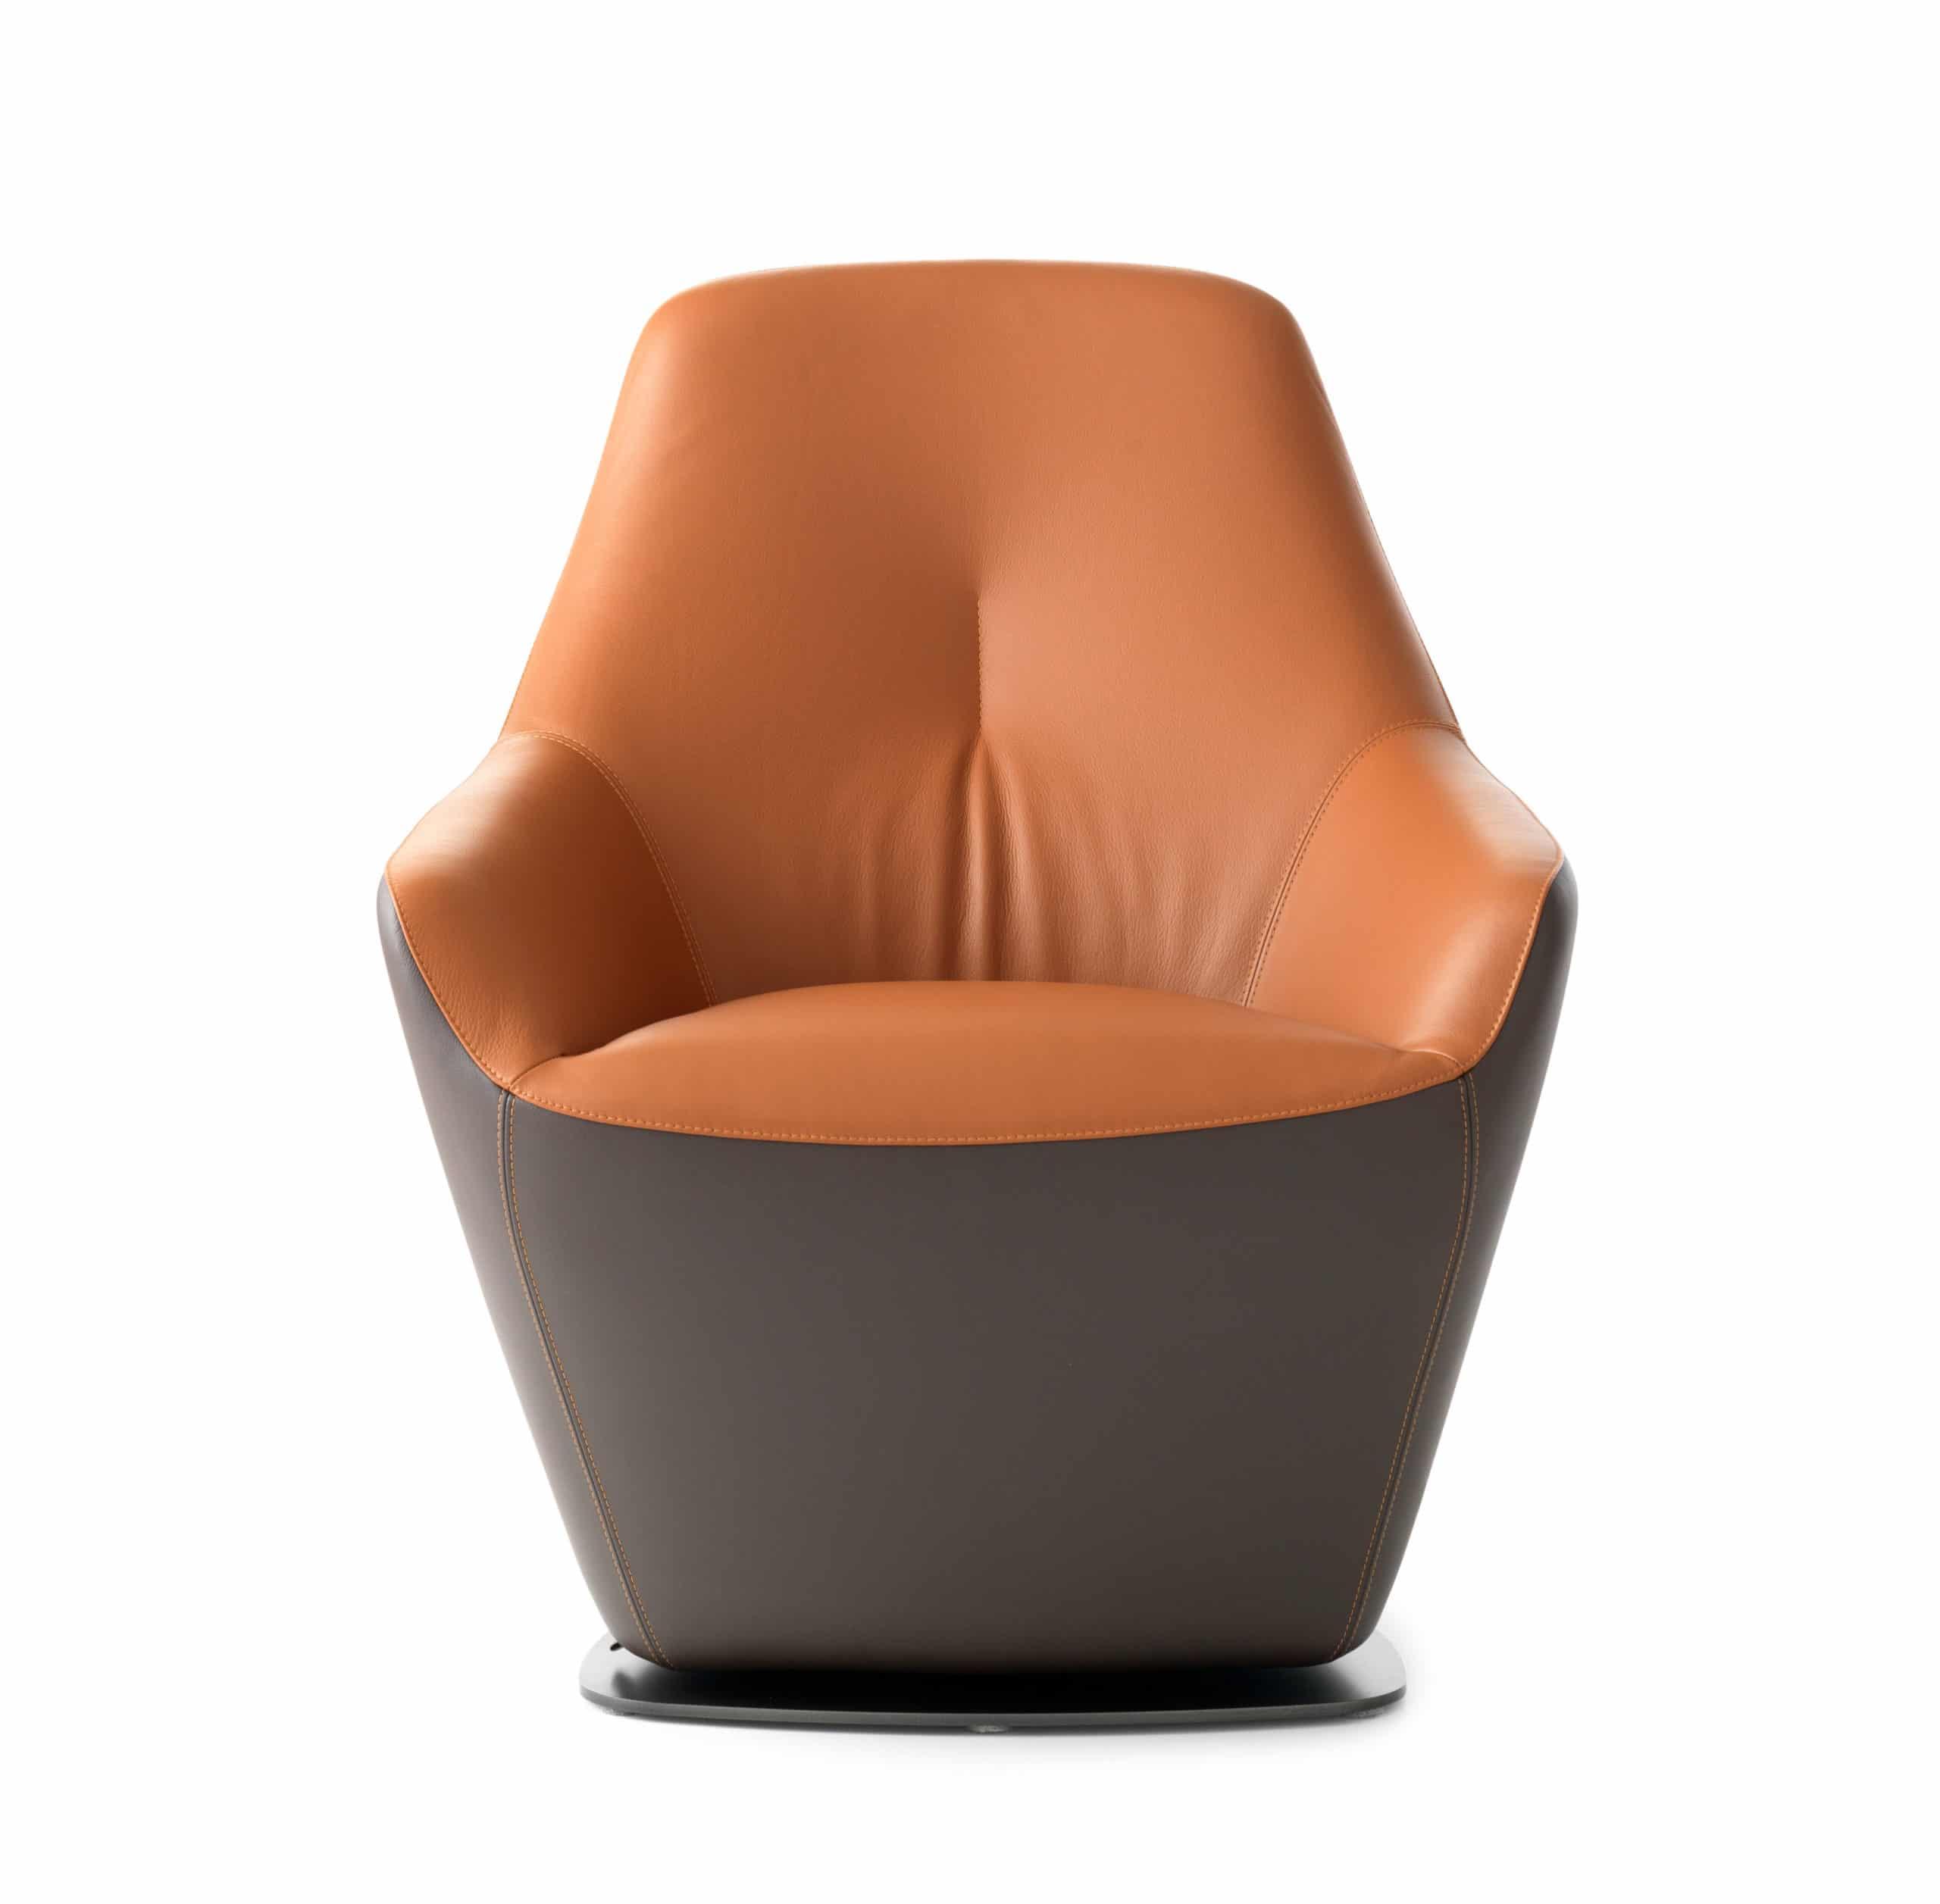 Leolux fauteuil Cantate